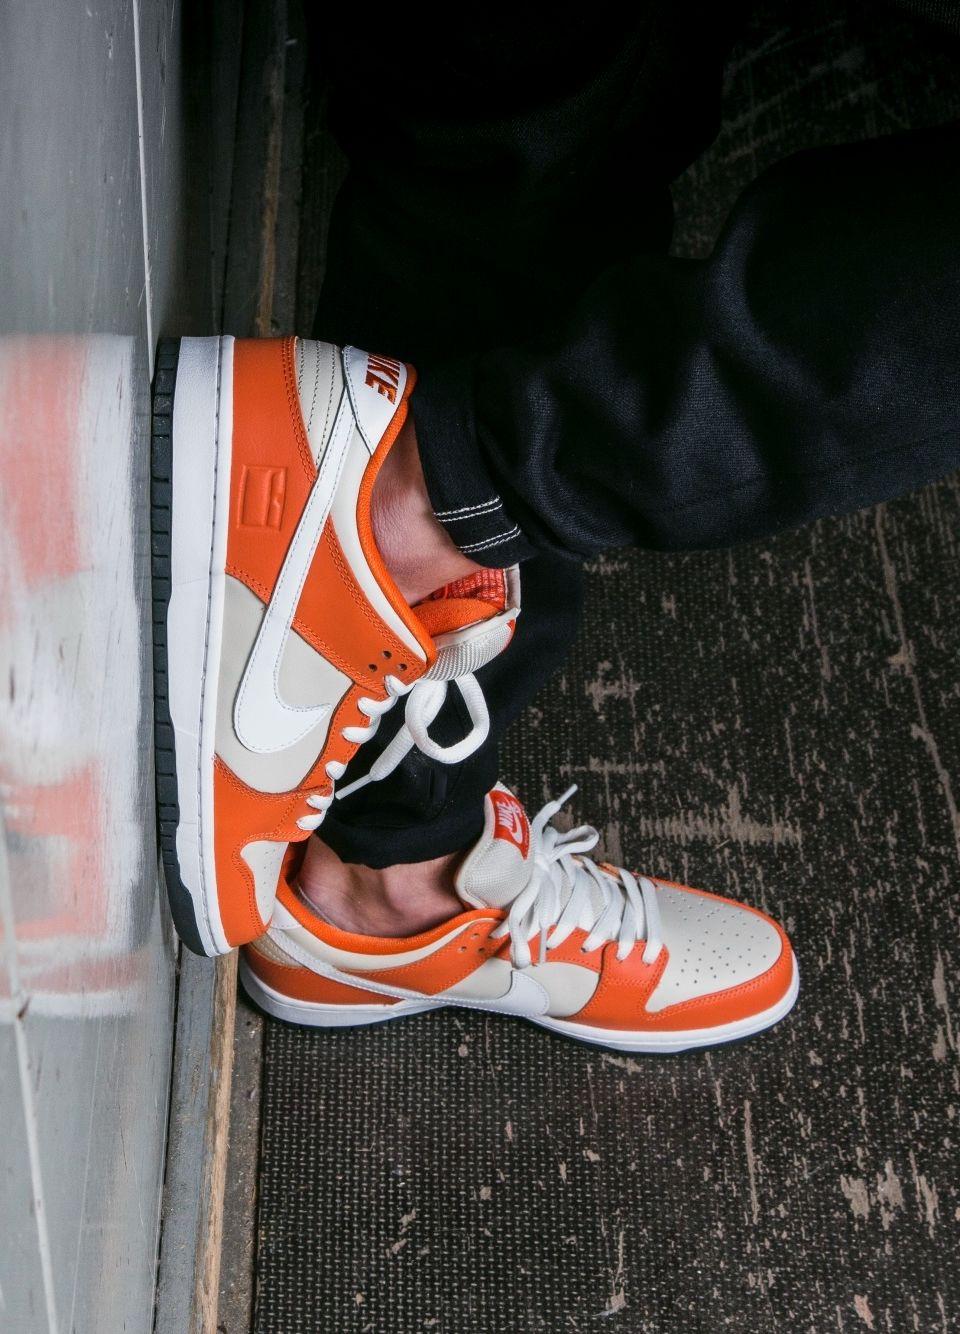 quality design 7daa6 92240 Nike SB Dunk Low Premuim QS